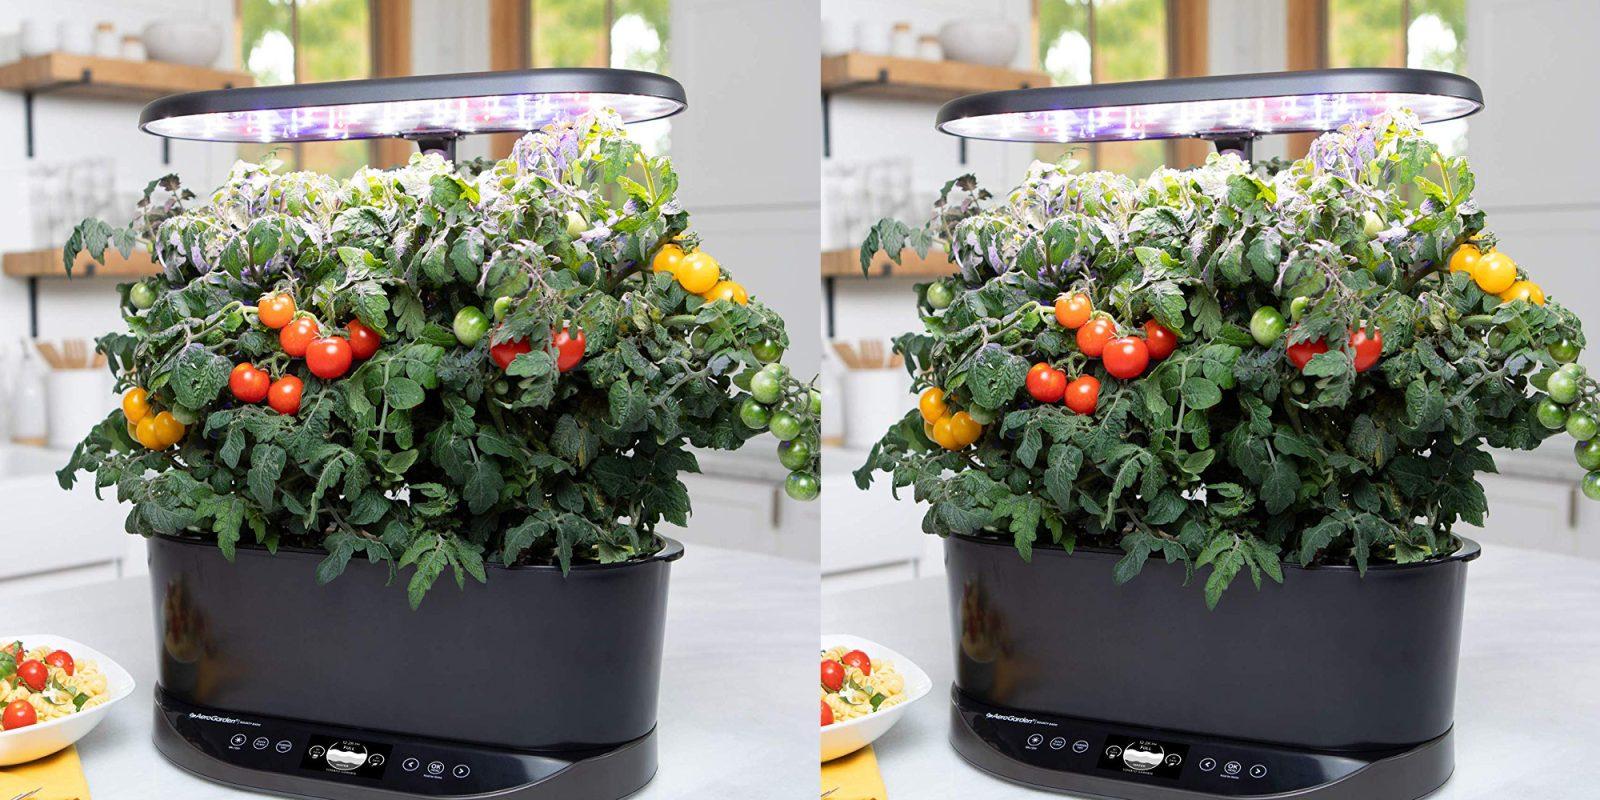 AeroGarden's Bounty Basic Indoor Garden is down to $160 at Amazon ($140 off)